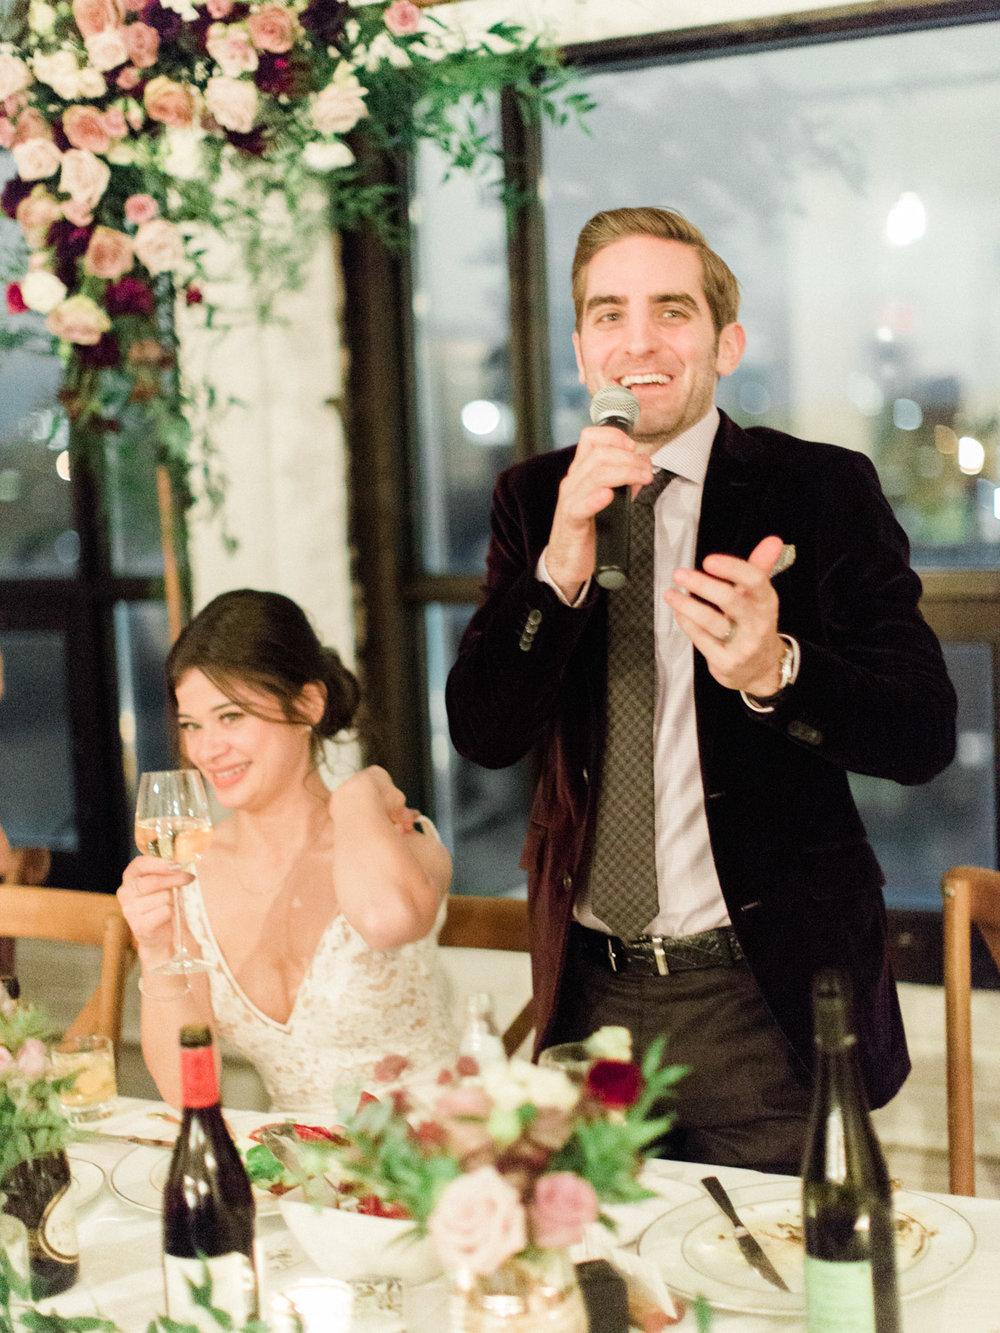 corynn-fowler-photography-toronto-collingwood-destination-wedding-photographer-863.jpg